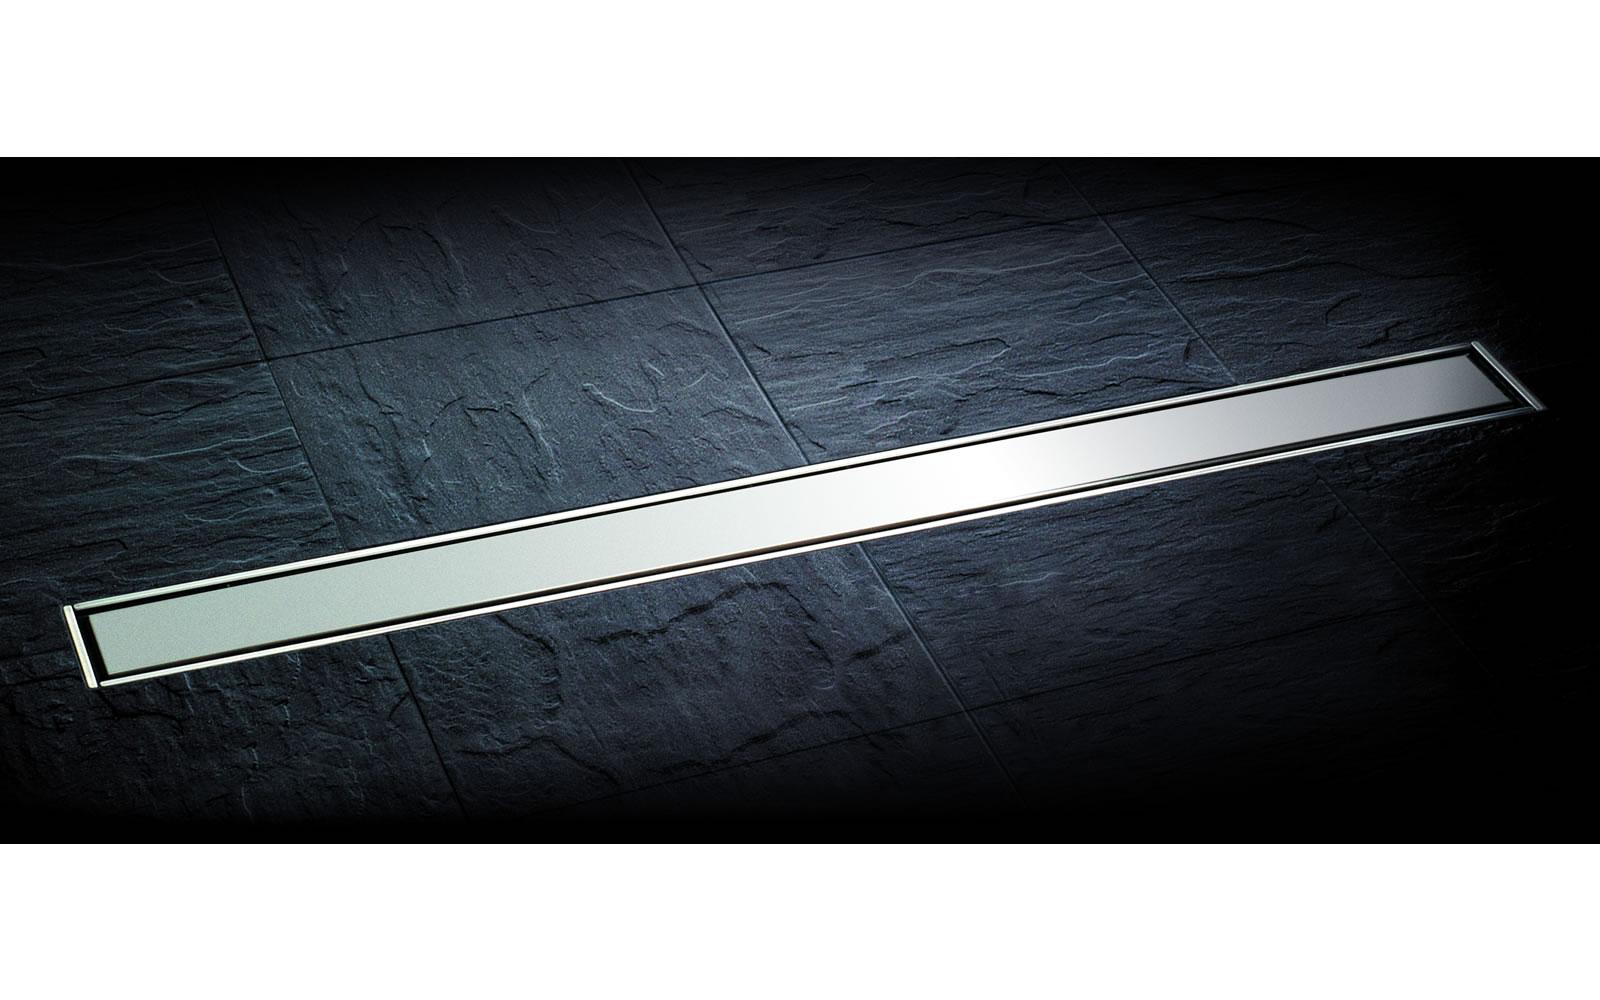 KESSEL Duschrinne Linearis Compact - DN 50 / Länge 850 mm